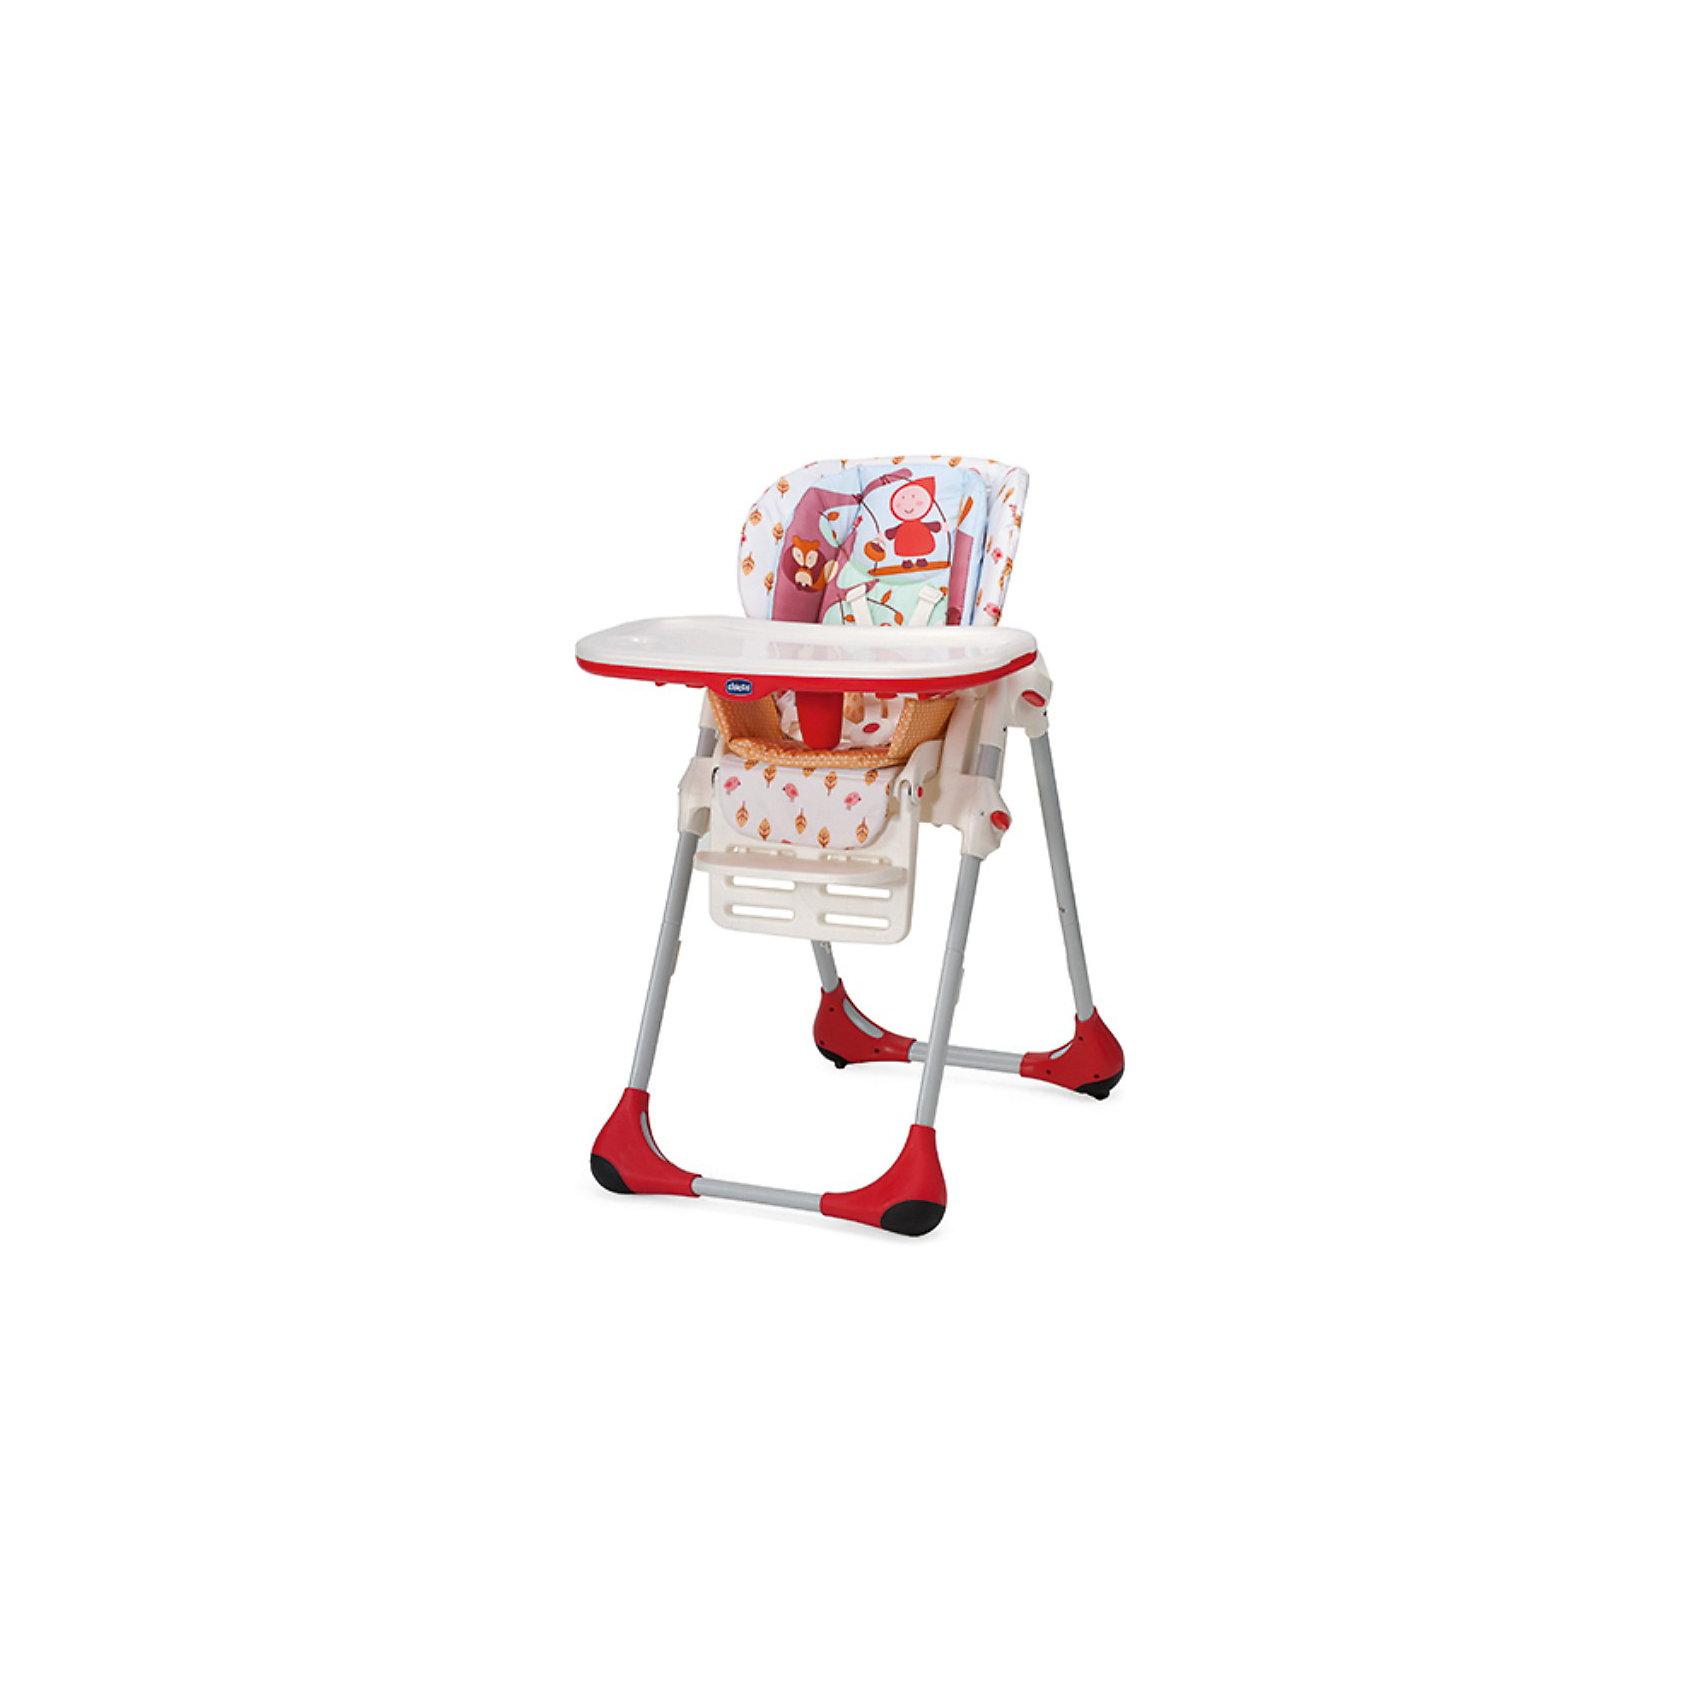 CHICCO Стульчик для кормления POLLY Happy Land, Chicco высокий стул для кормления chicco polly happy land